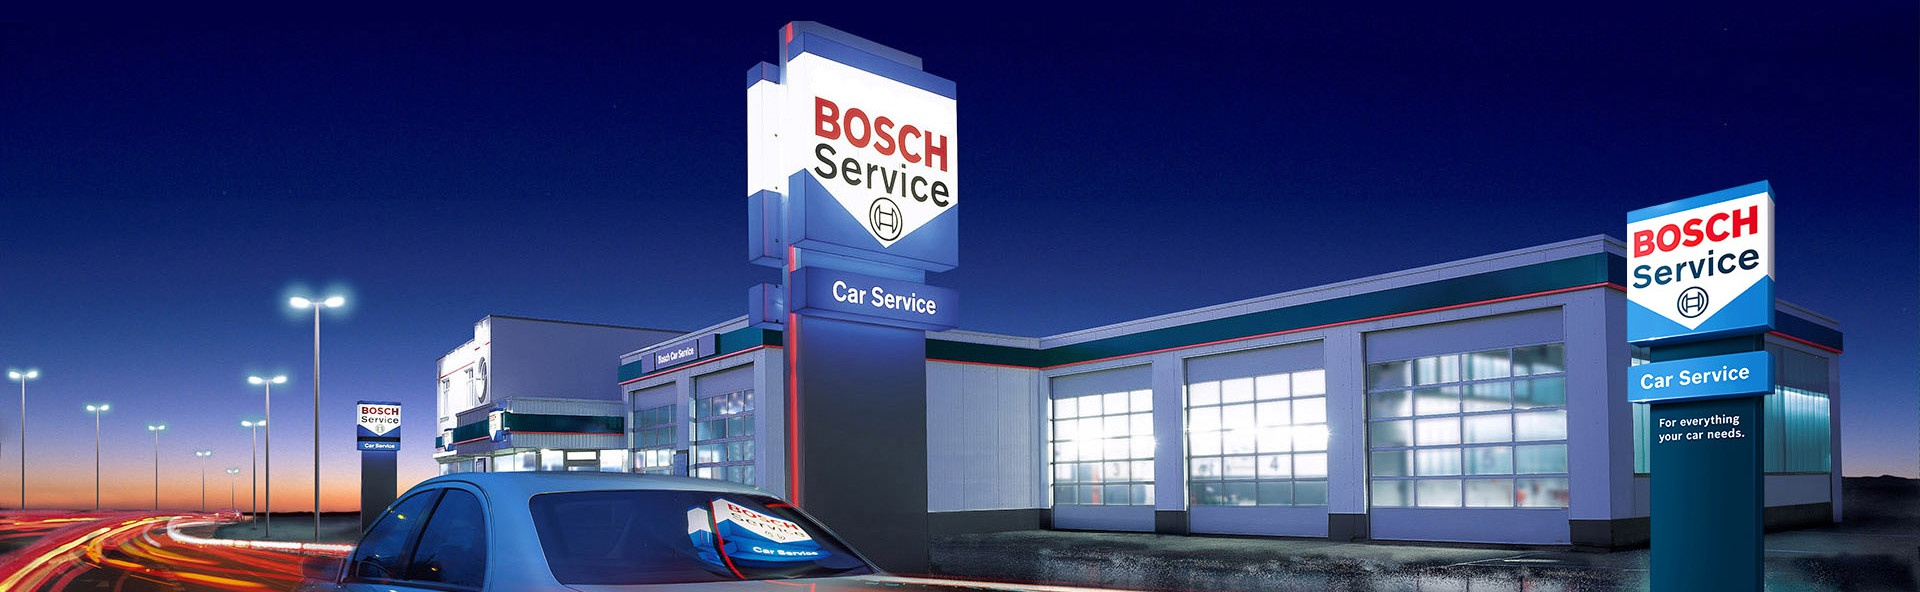 bosch car service brezan automaterialen. Black Bedroom Furniture Sets. Home Design Ideas